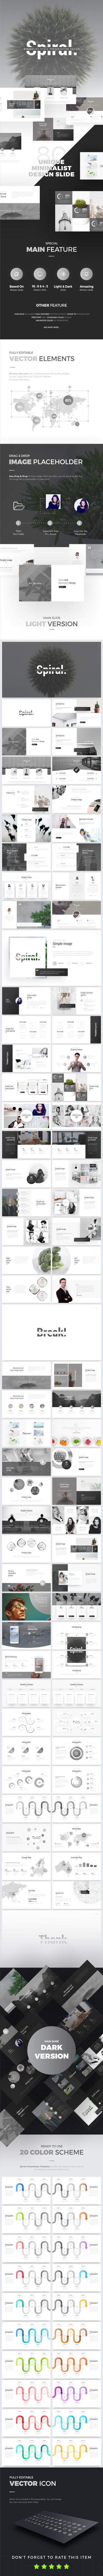 Spiral Minimalis Presentation - Creative PowerPoint Templates